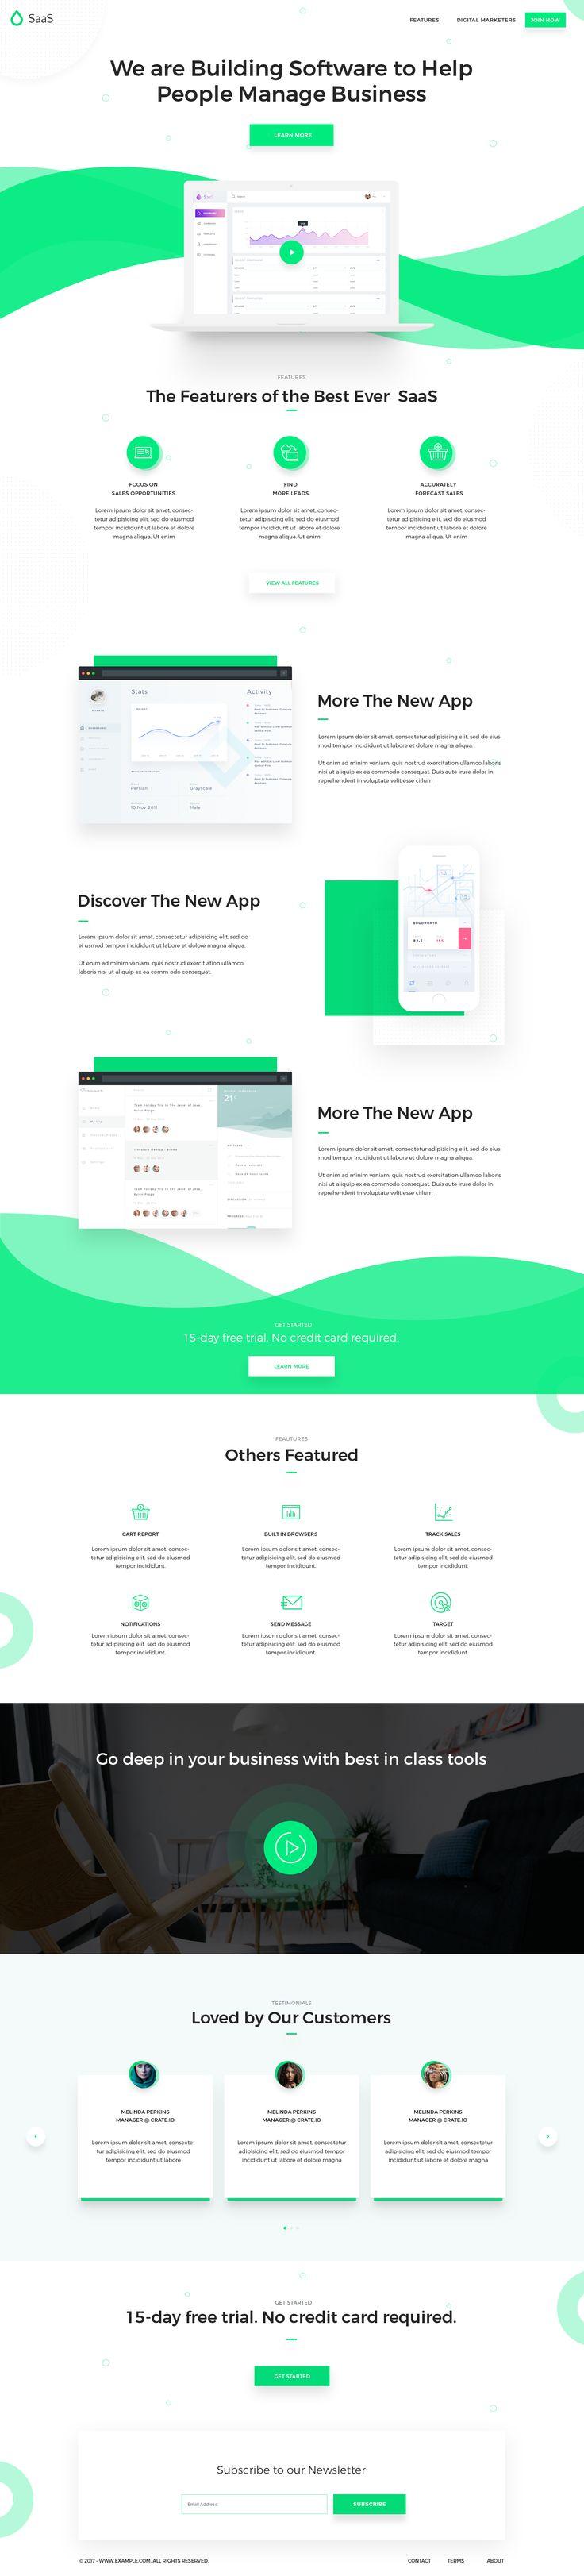 SaaS Software Landing Page